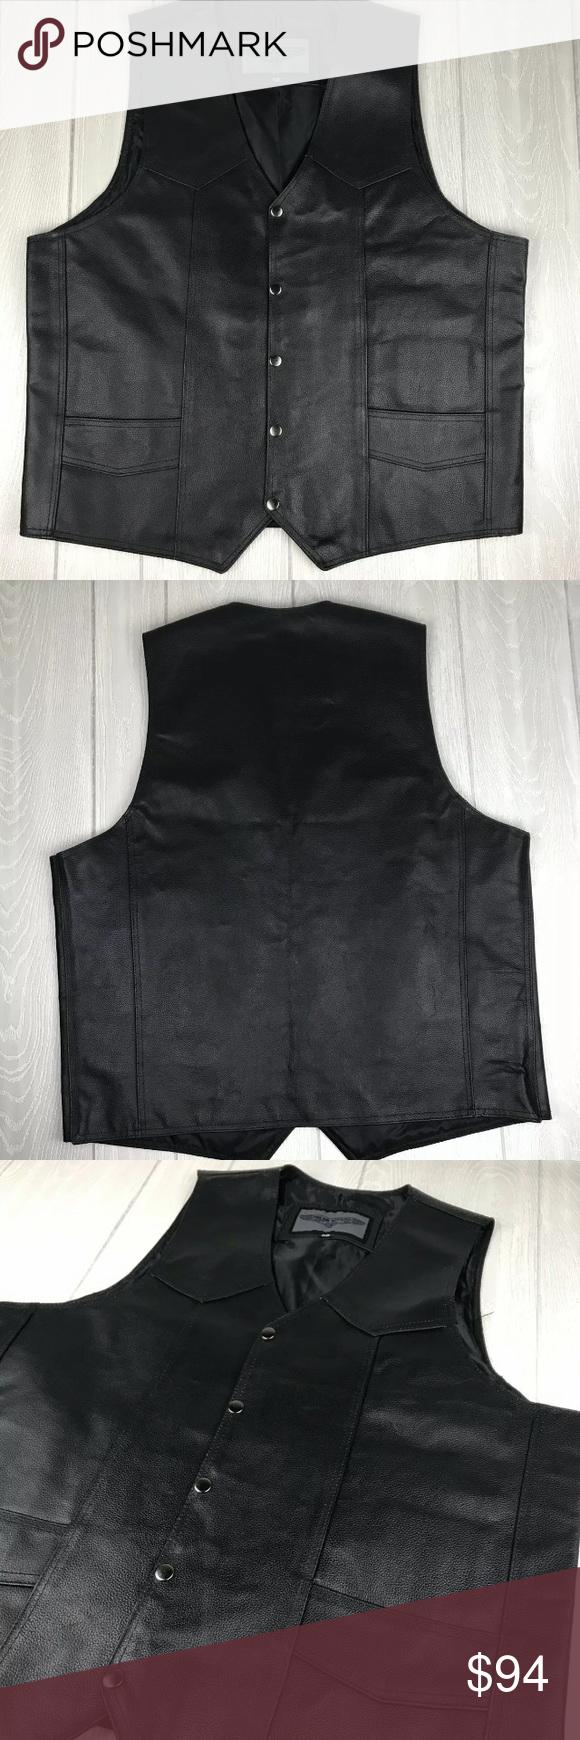 Dream Apparel leather concealed carry vest Dream Apparel Men's Motorcycle Leathe…